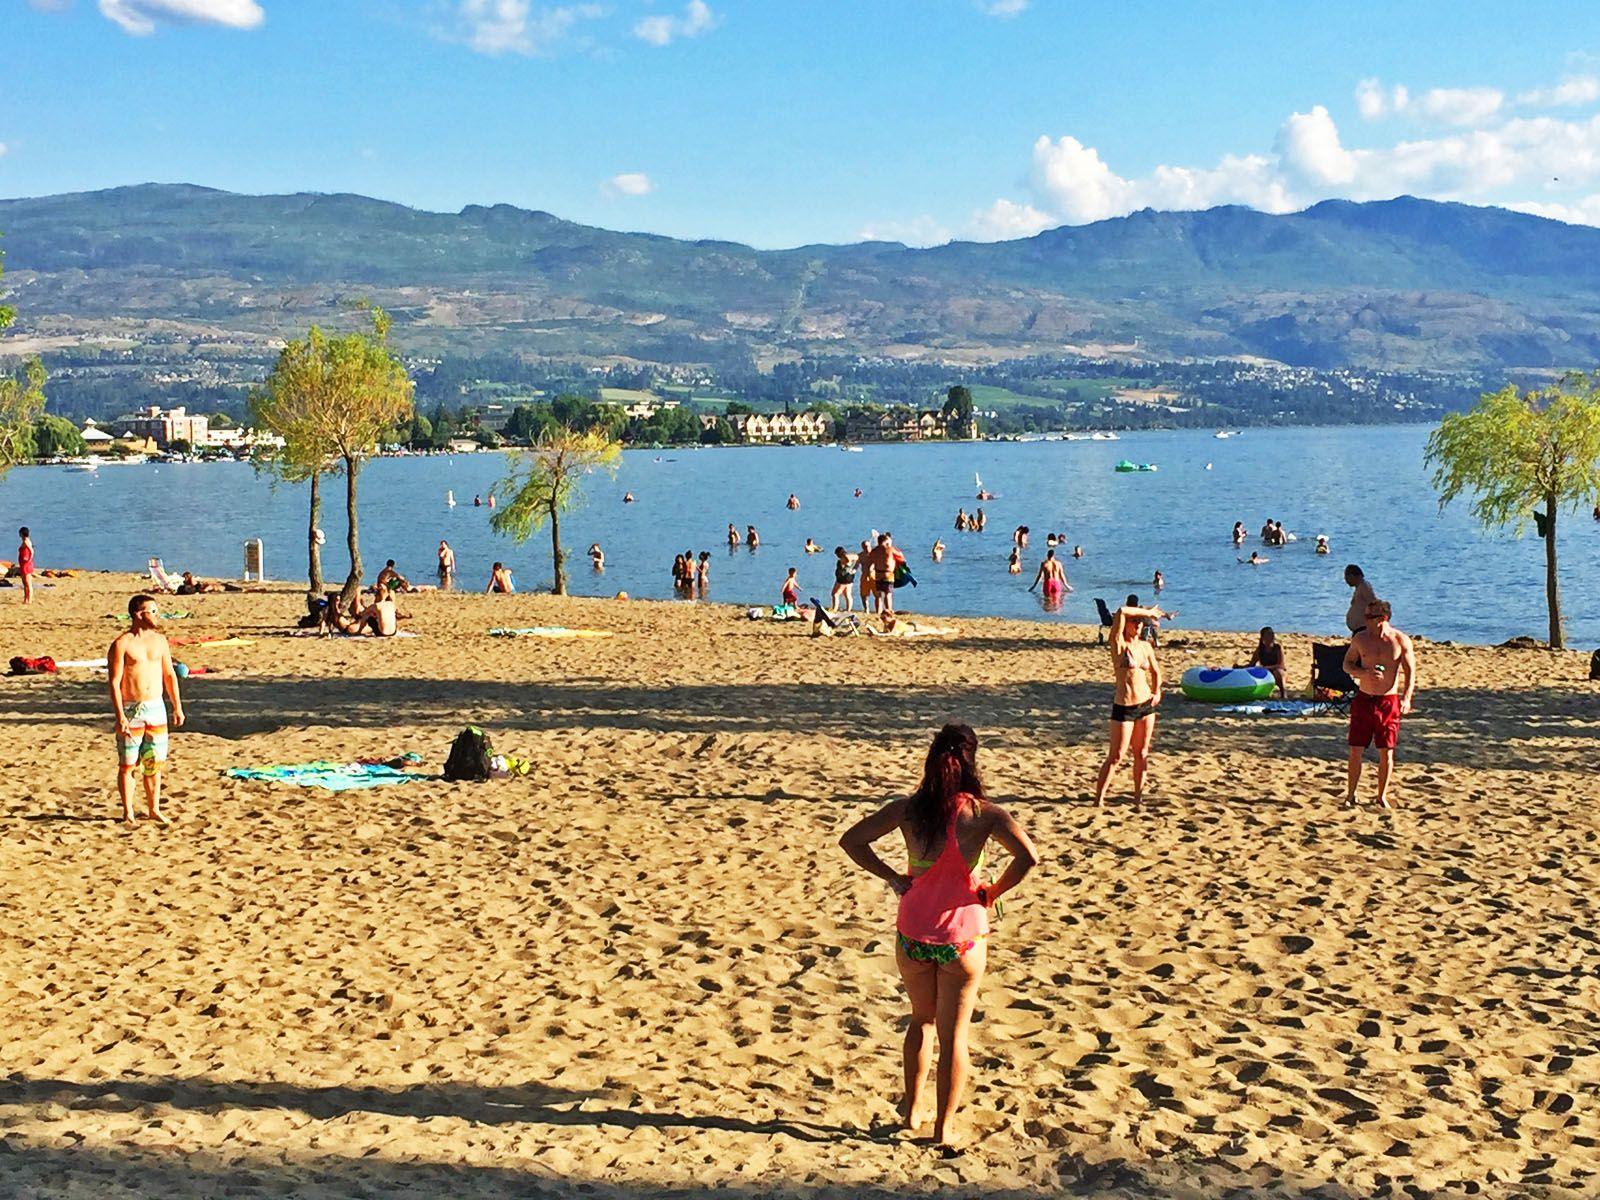 Gyro Beach Kelowna Kelowna British Columbia British Columbia British Columbia Canada